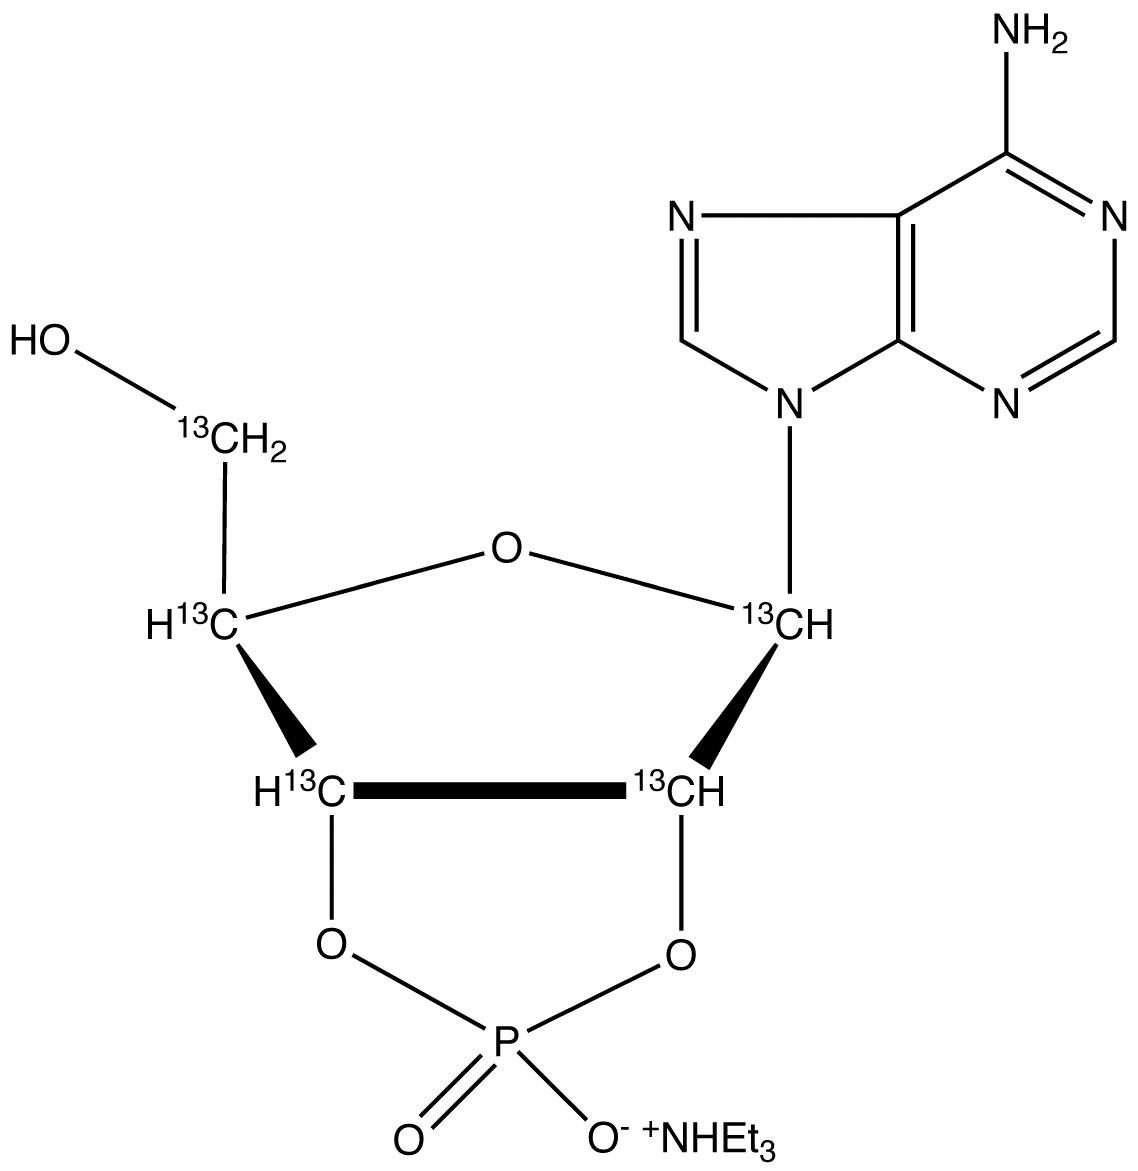 Adenosine 2',3'-Cyclic Phosphate-<sup>13</sup>C<sub>5</sub> Triethylammonium Salt